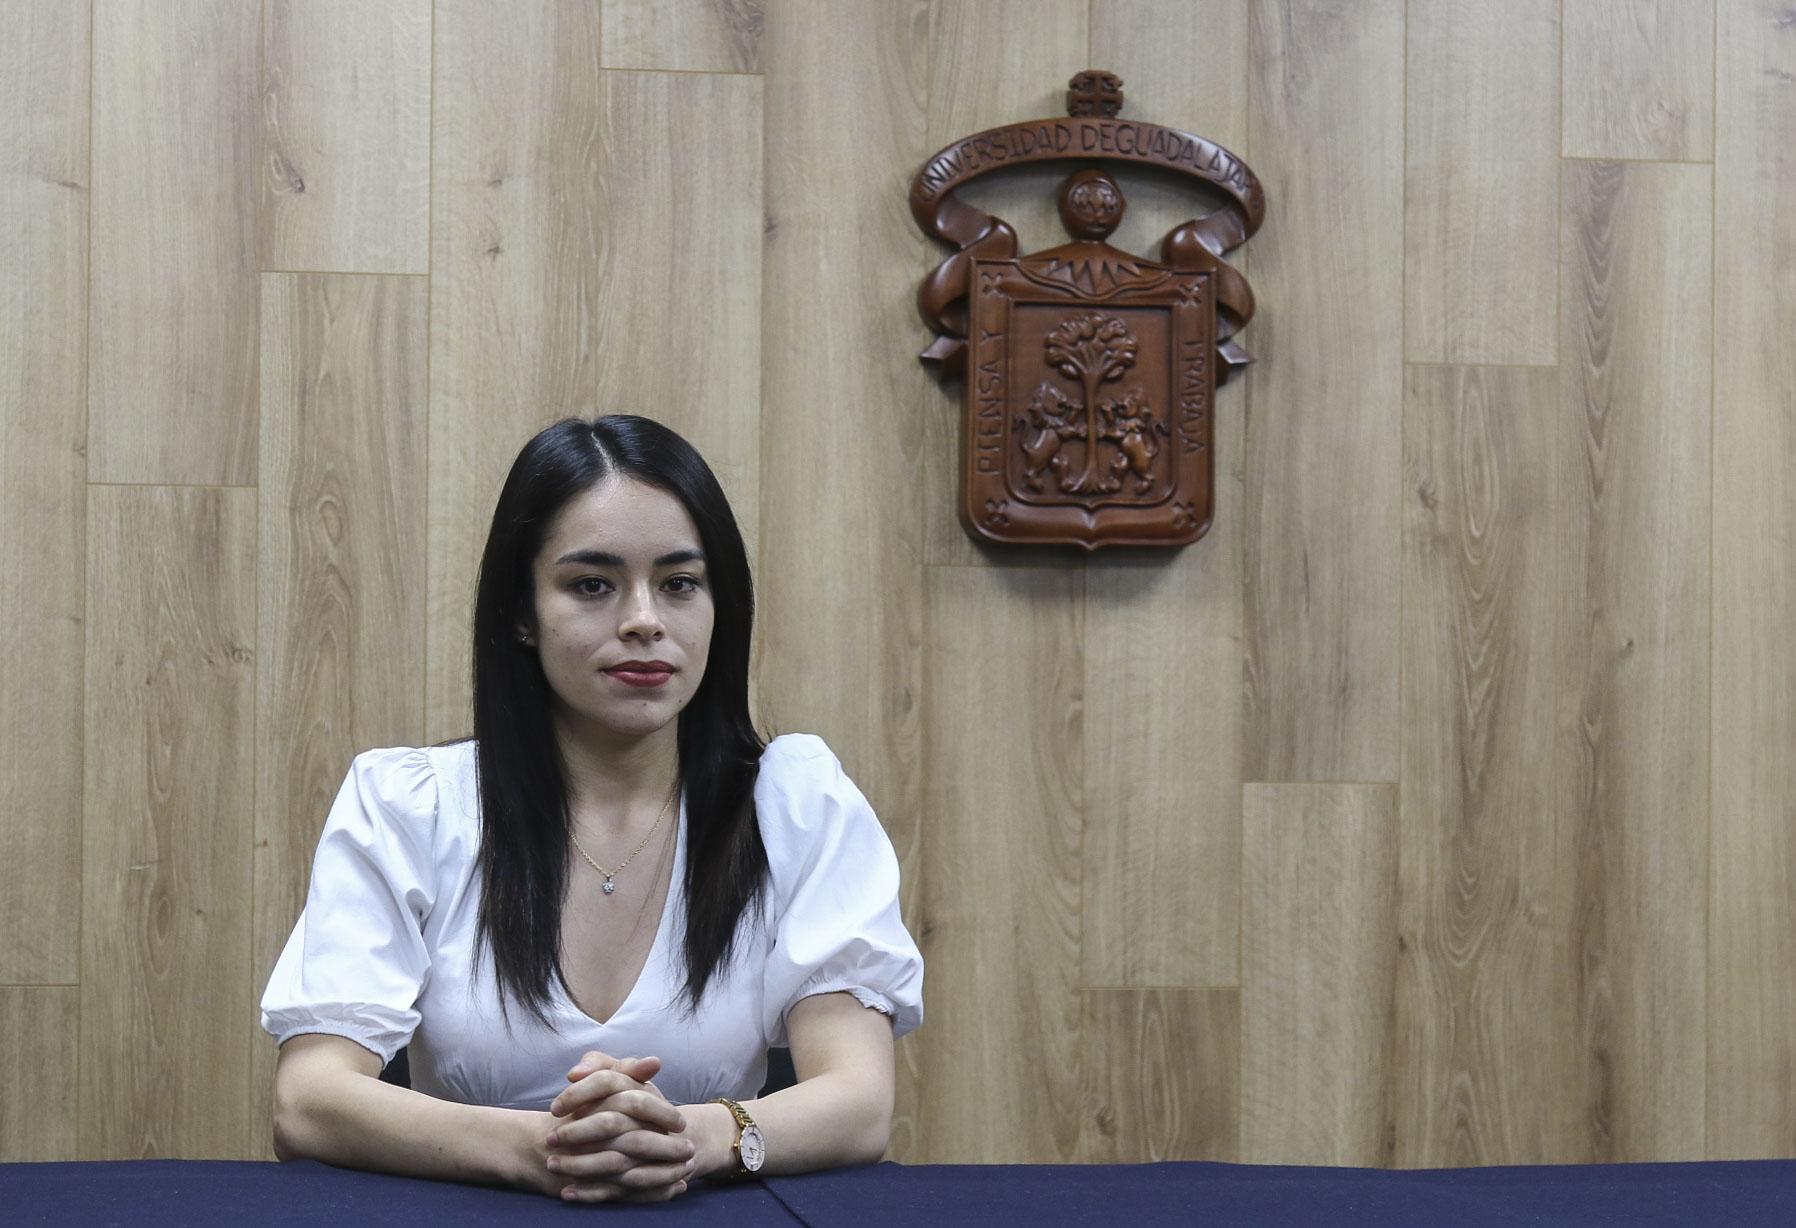 La doctora Diana Emilia Martínez Fernández